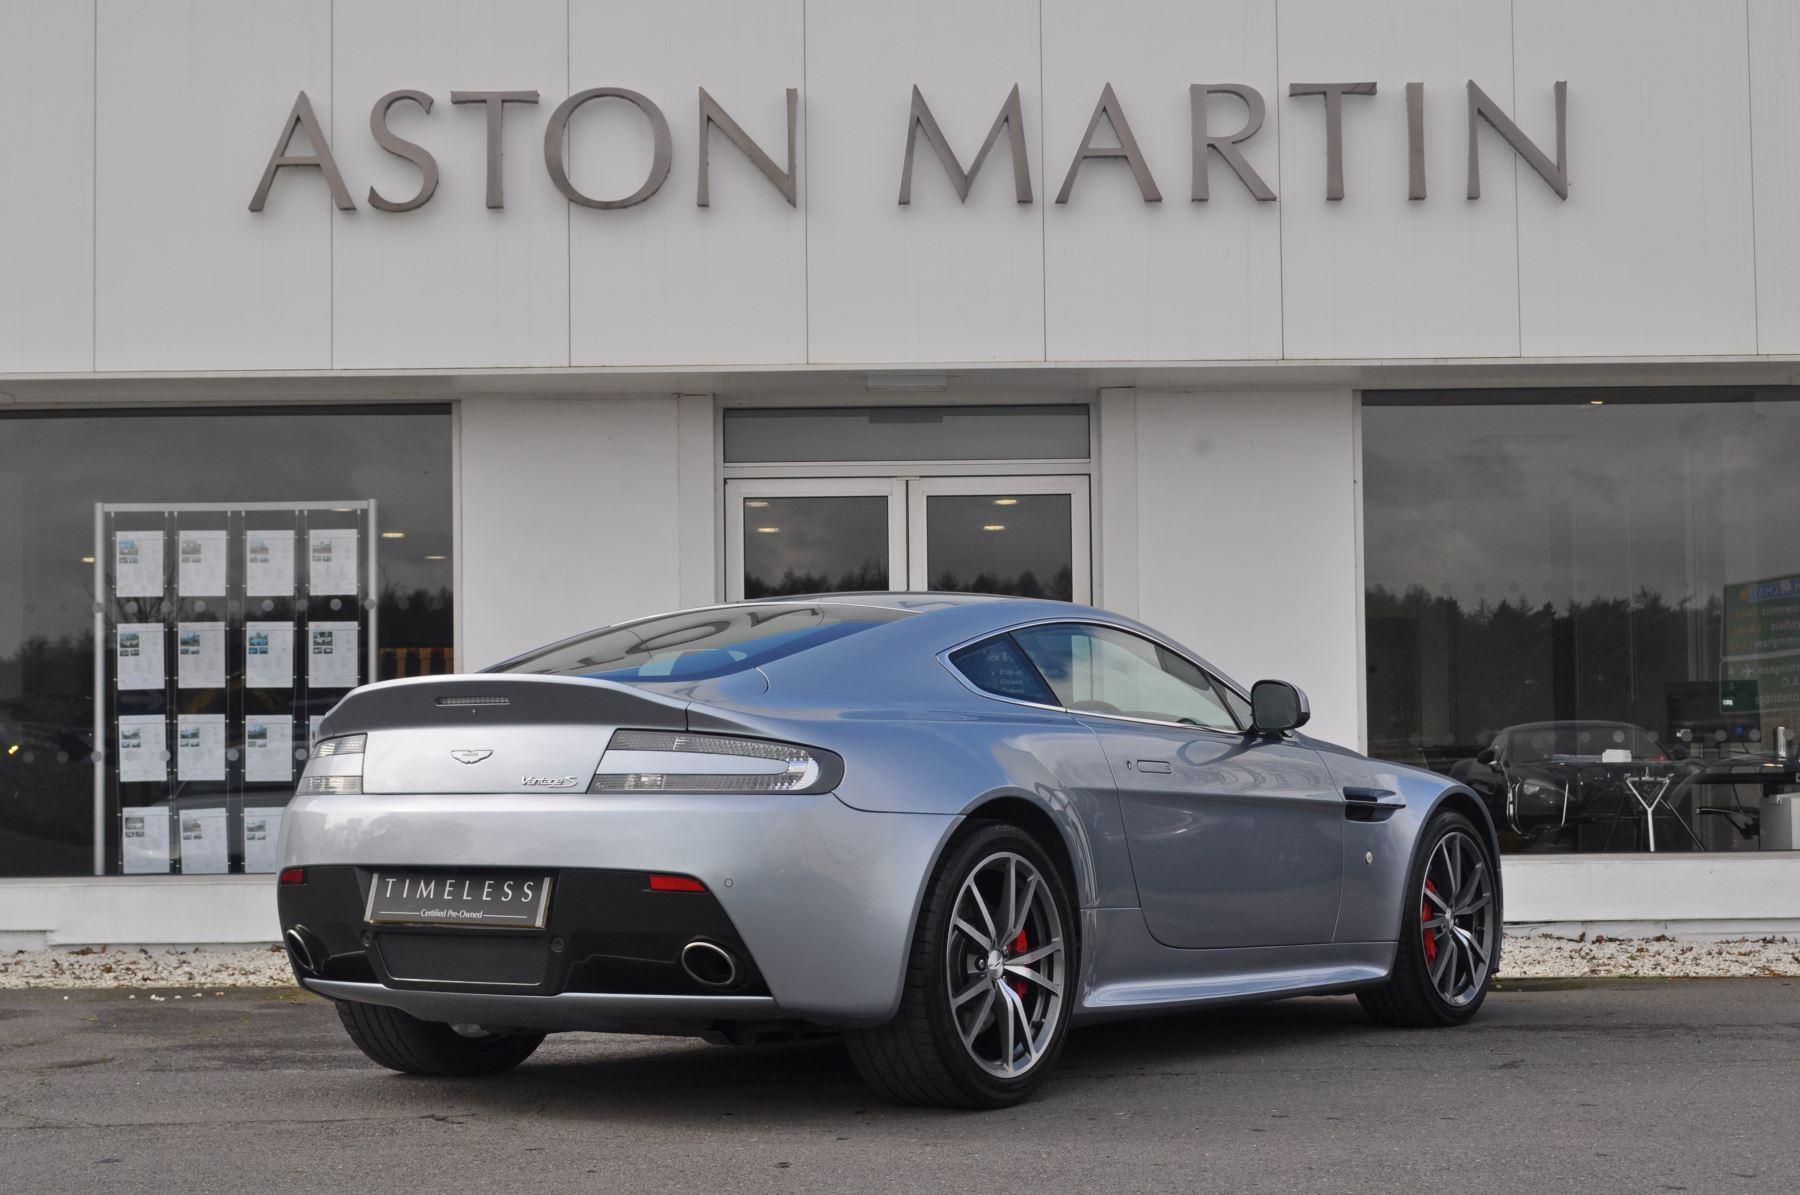 Aston Martin V8 Vantage S Coupe Coupe image 5